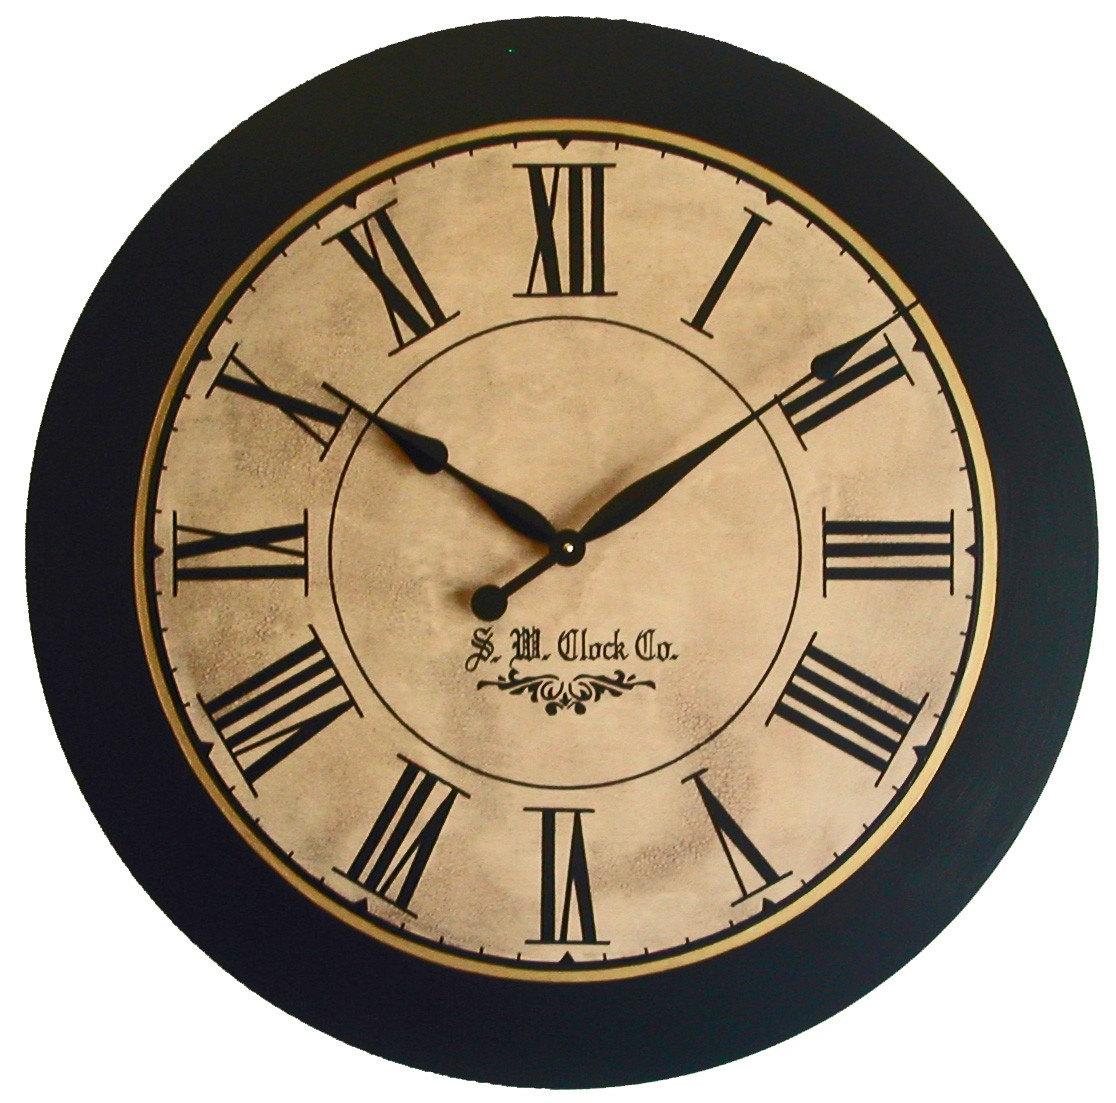 36 inch lexington large wall clock antique style big roman. Black Bedroom Furniture Sets. Home Design Ideas